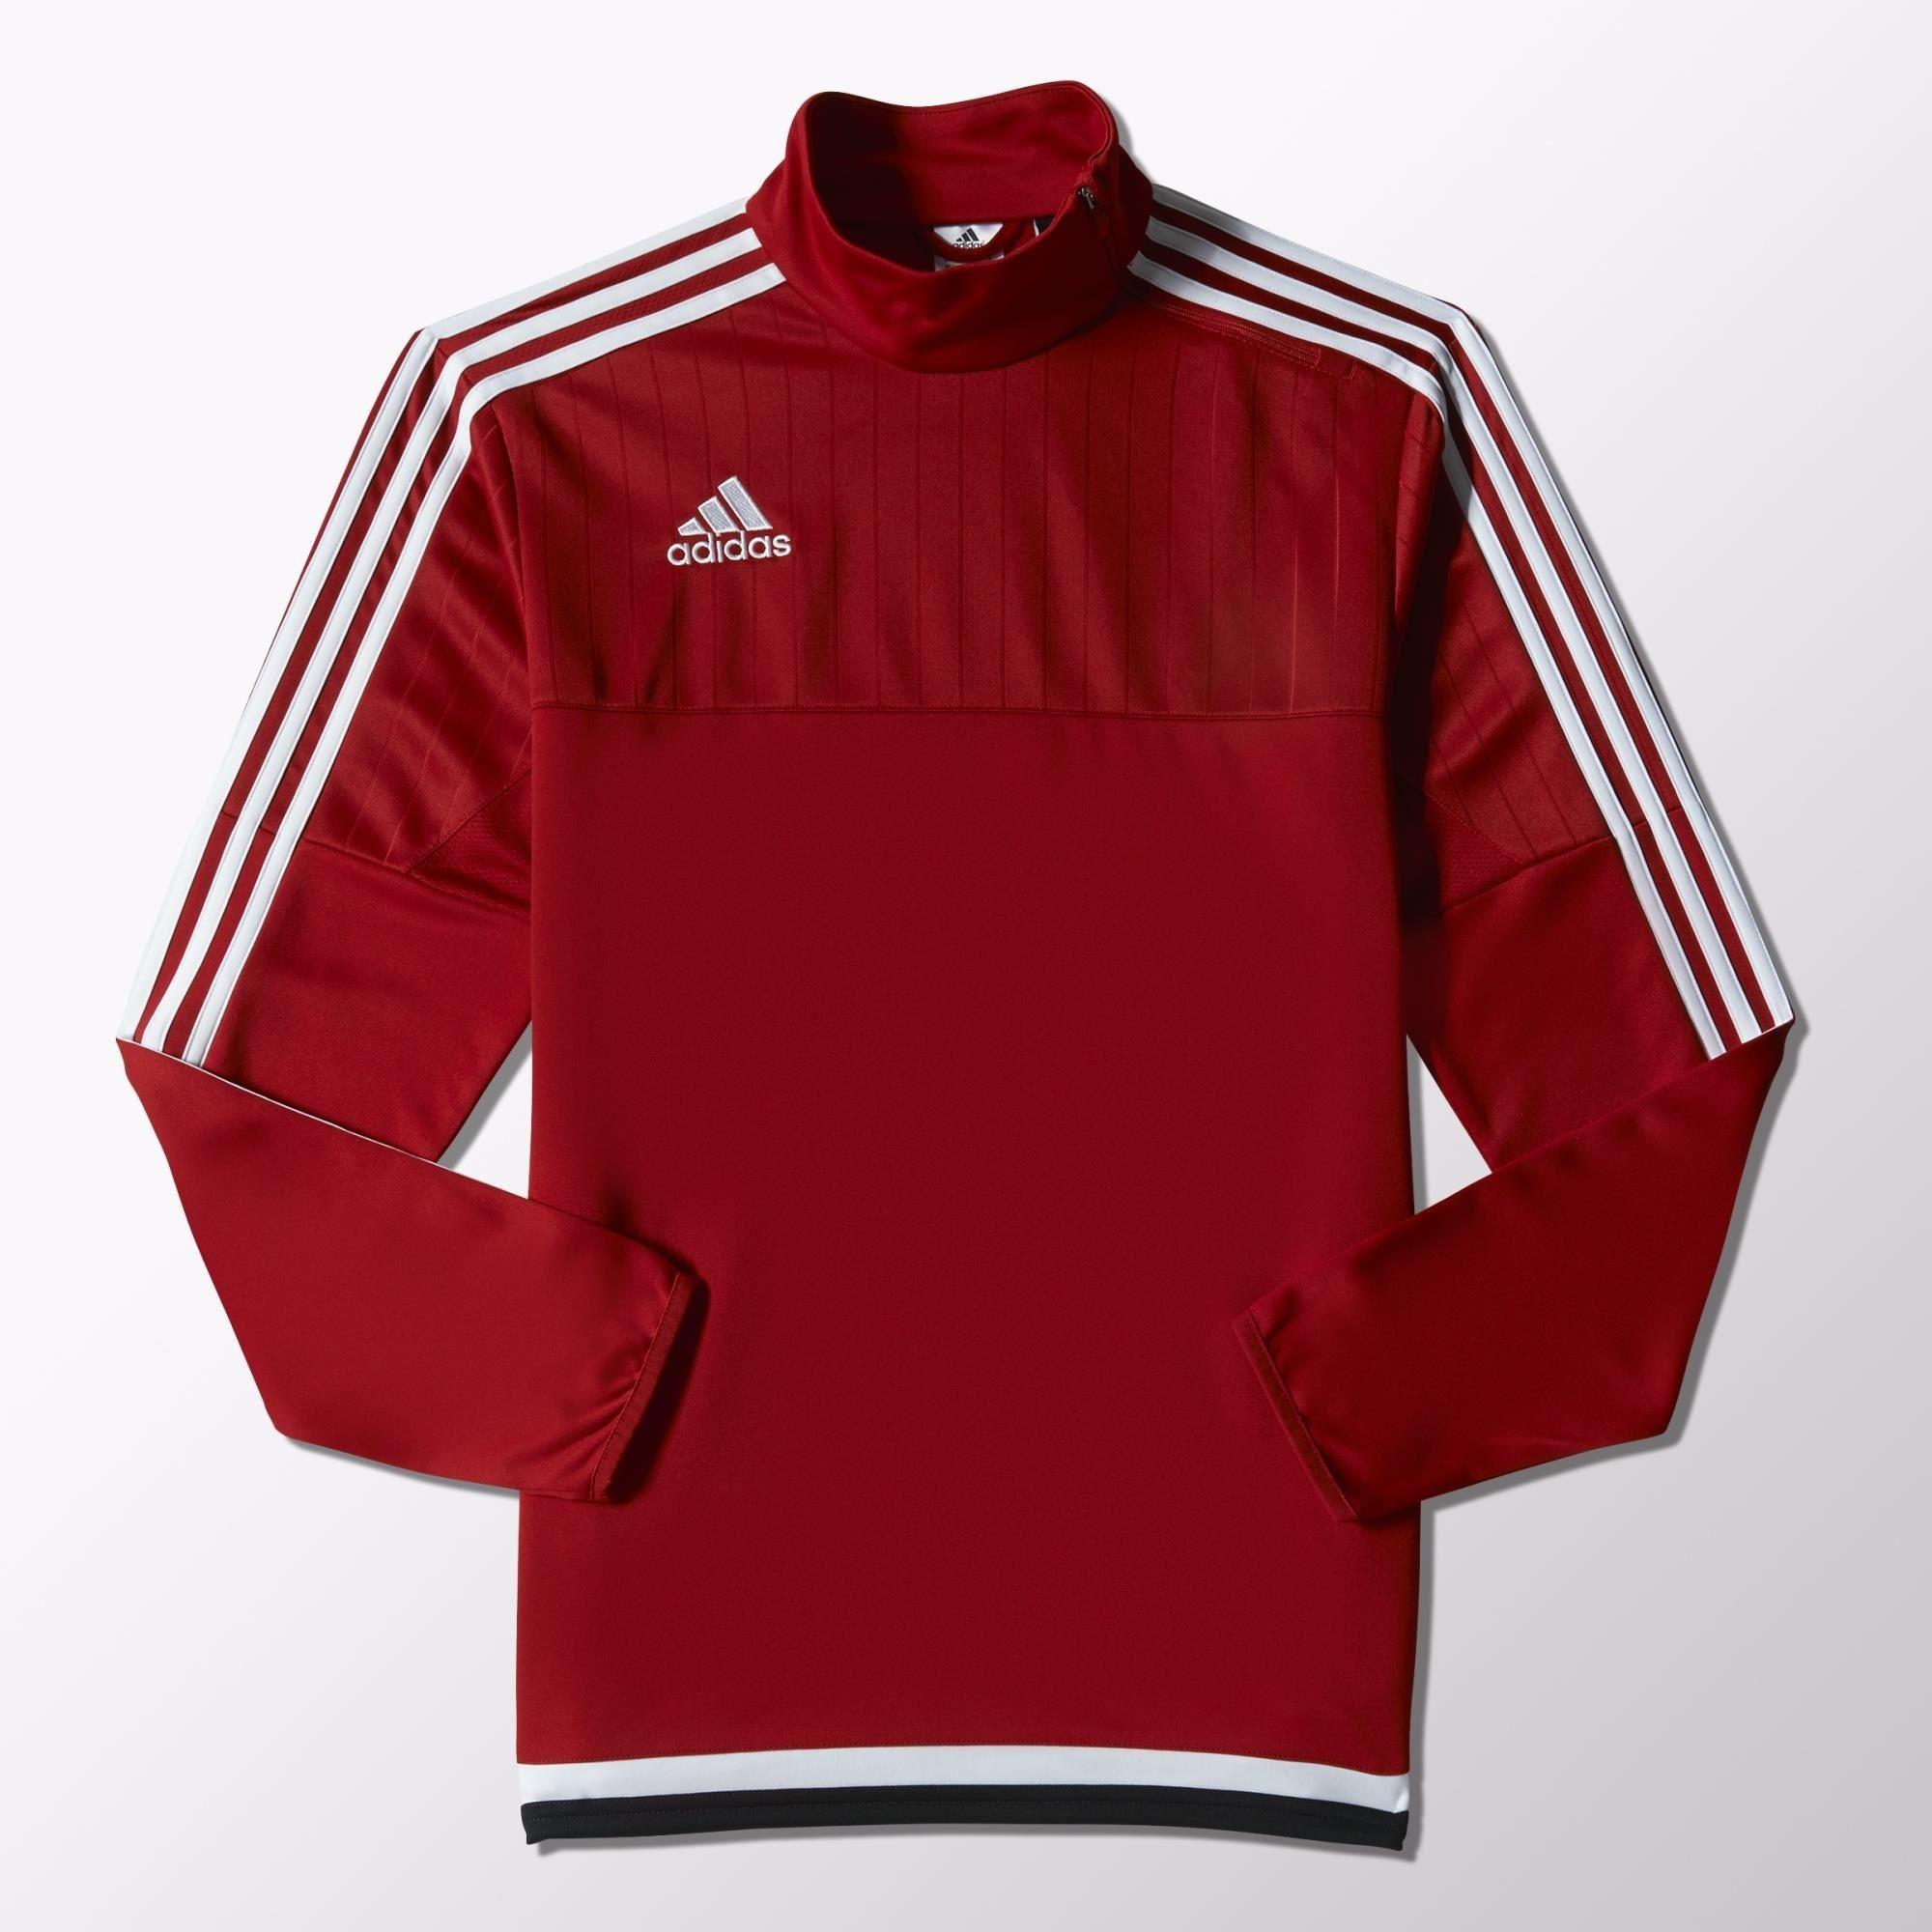 Männer Fußball Trainingsshirt Tiro15, POWRED/WHITE/BLACK, XL